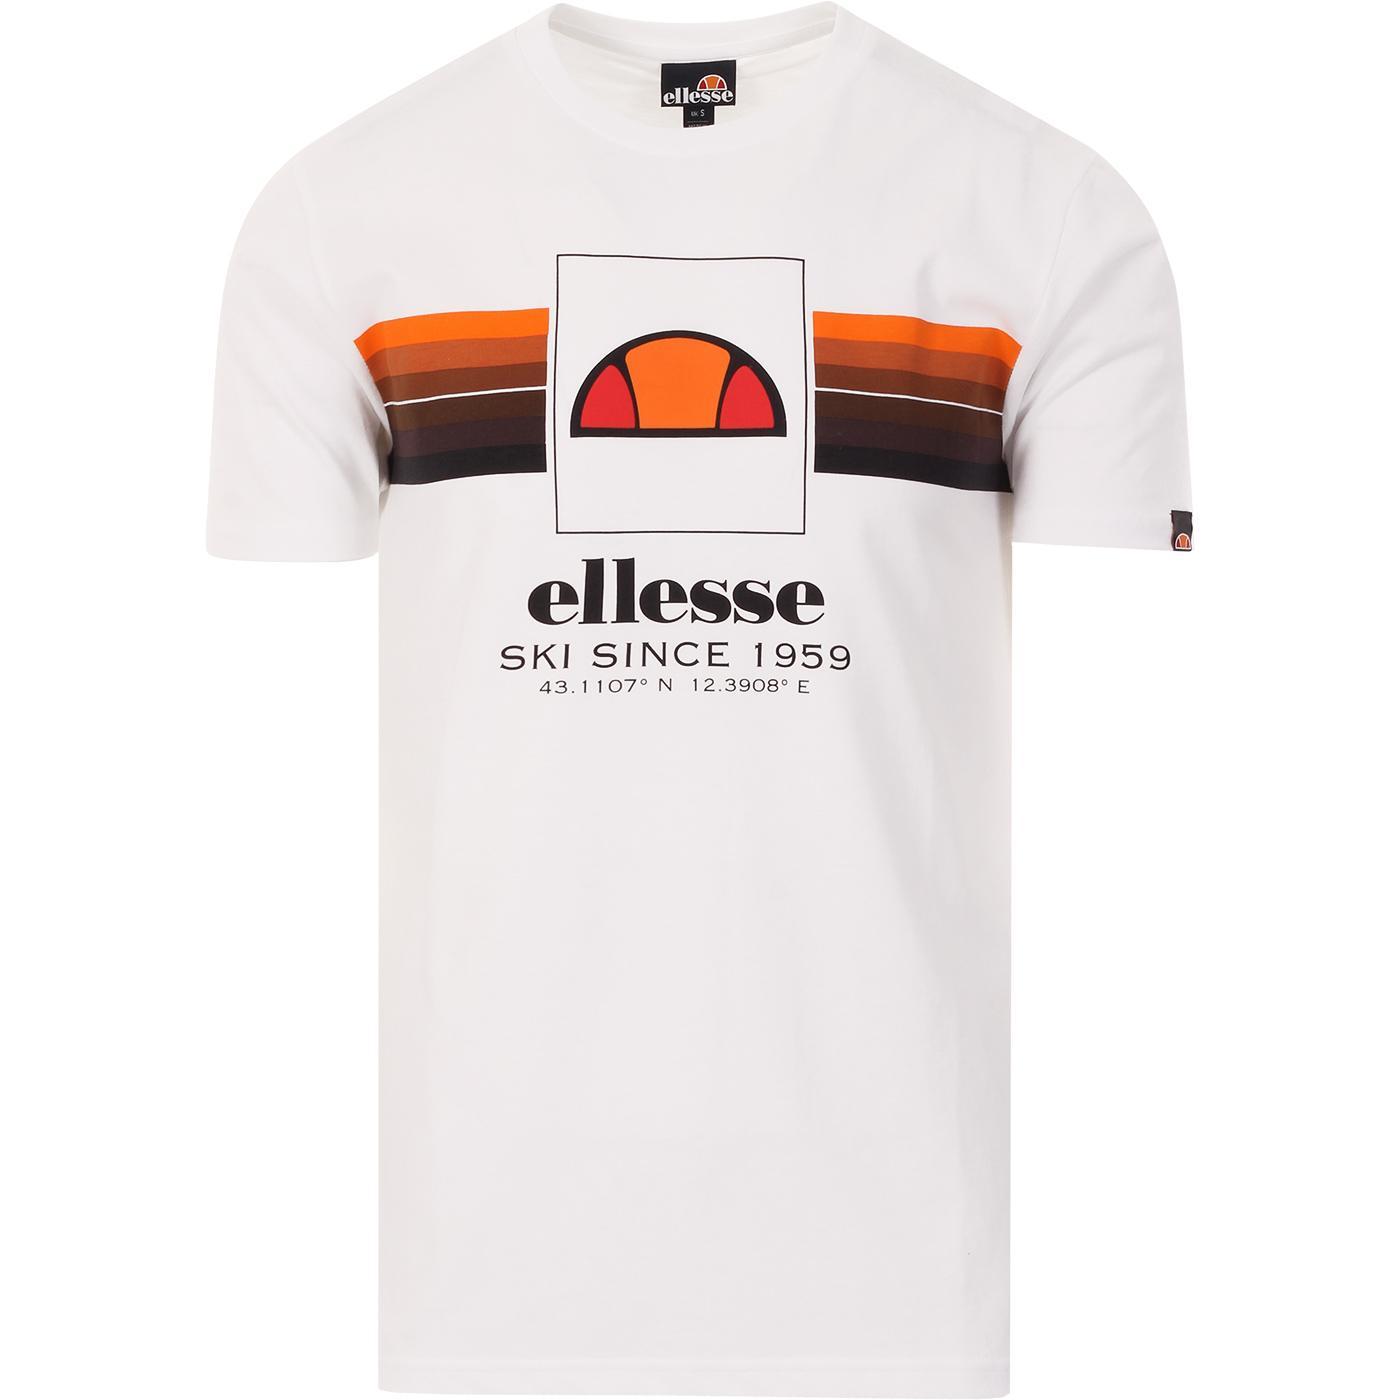 Colo ELLESSE Retro 70s Chest Stripe Tee (White)